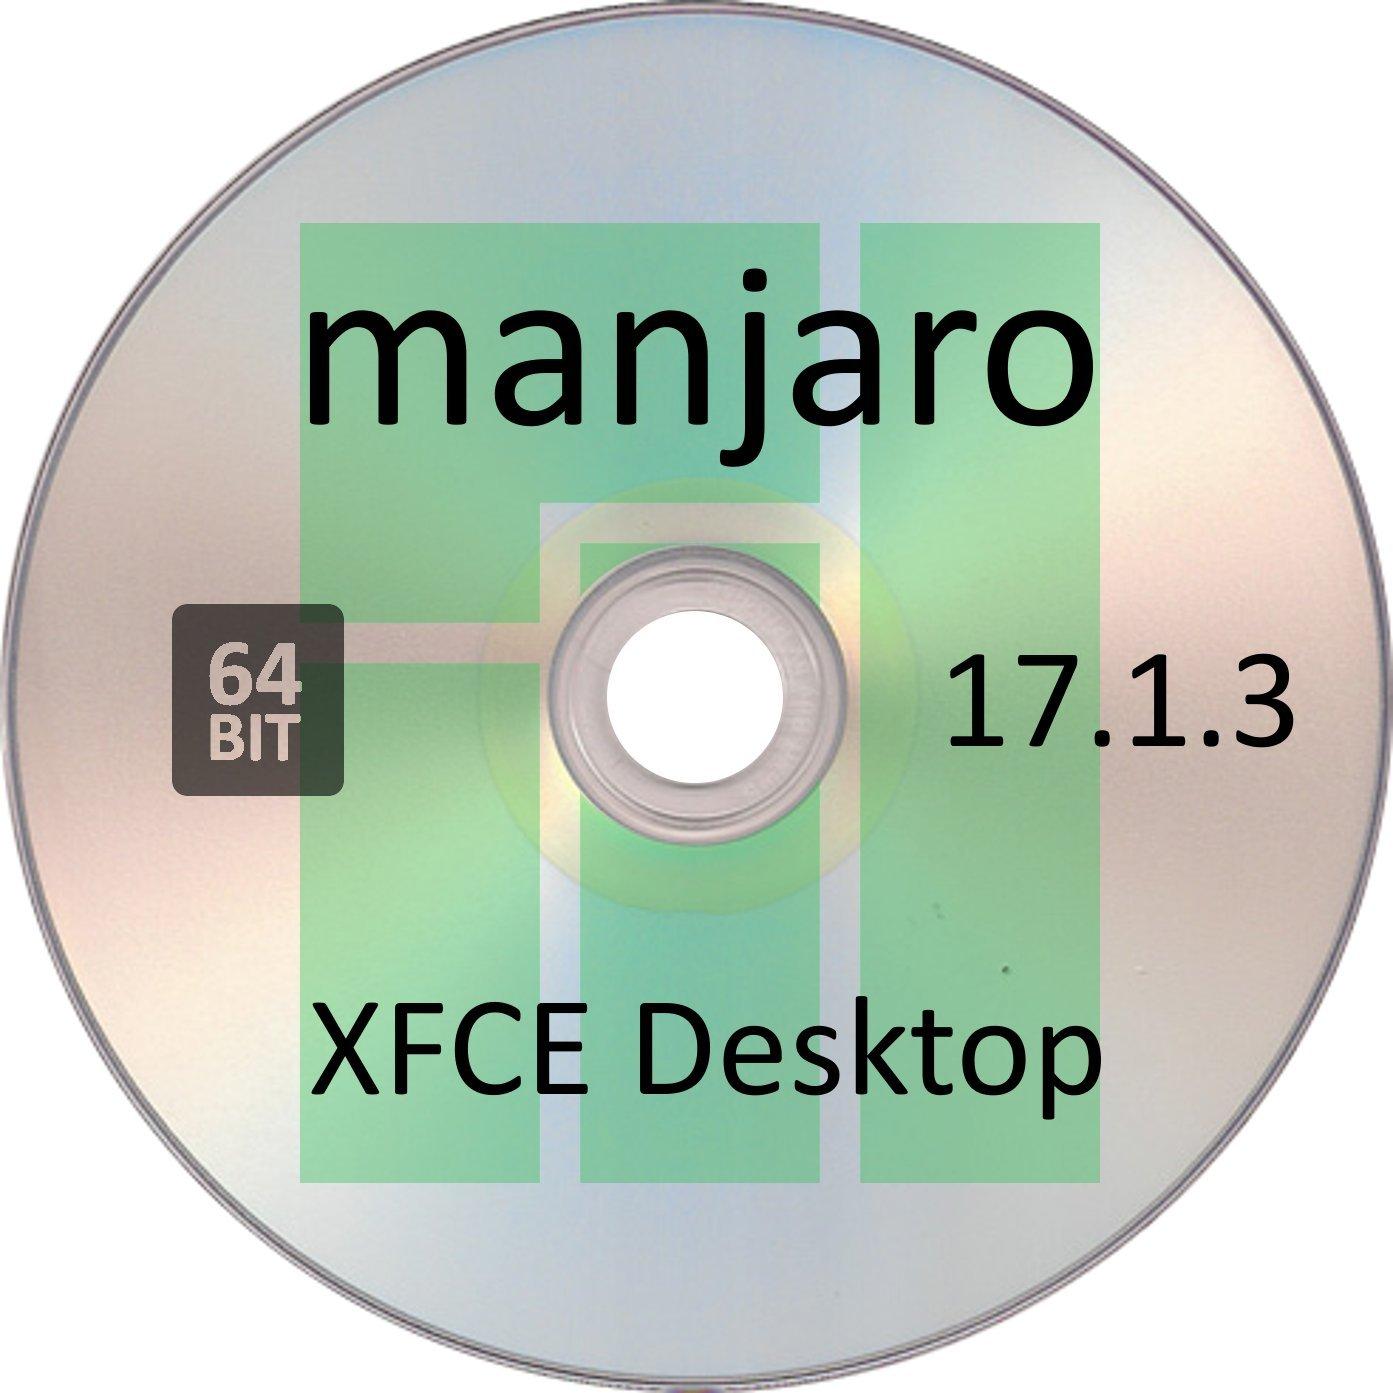 Manjaro Linux 17.1.3, XFCE Desktop, 64 Bit by Linux2DVD